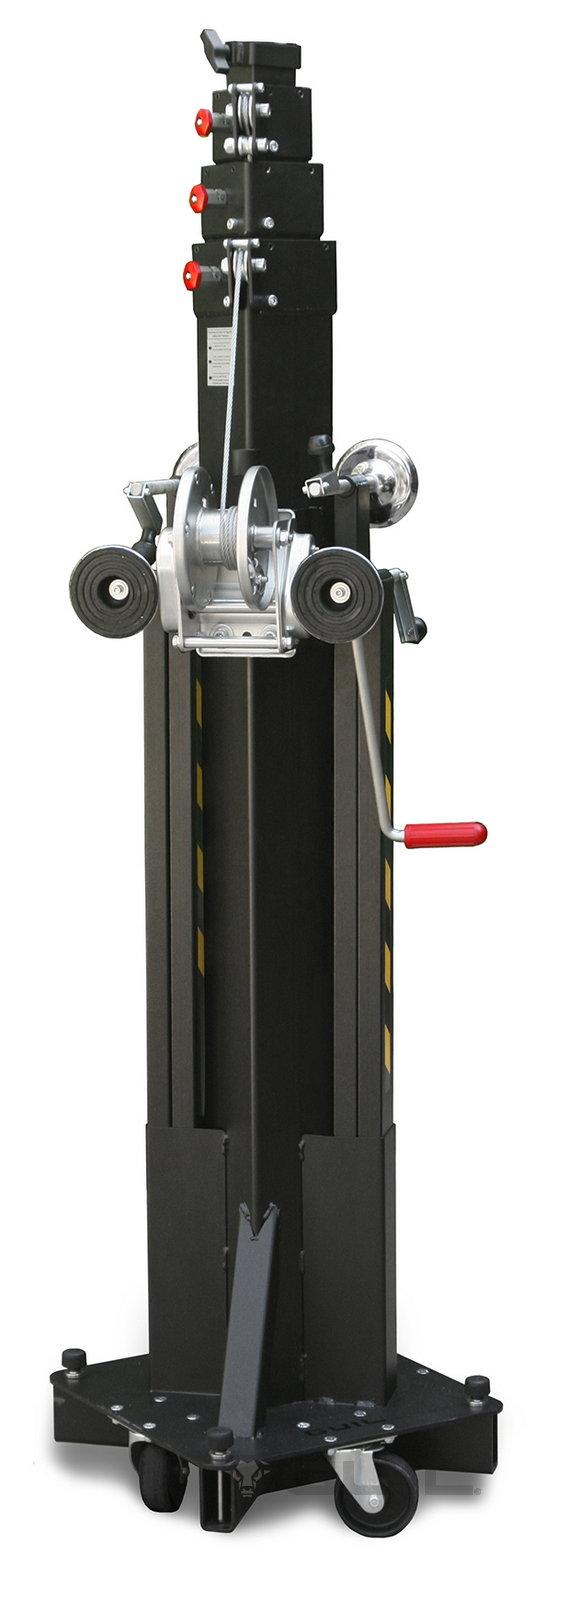 Materiaallift 1,8-5,2 m 250 kg (dutch) (2)